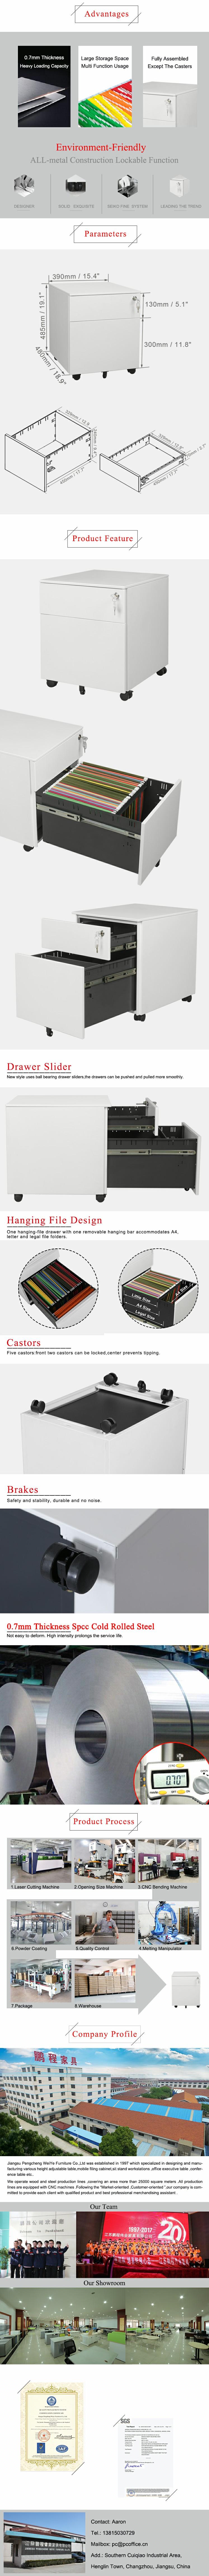 Pengcheng filing cabinet supplier